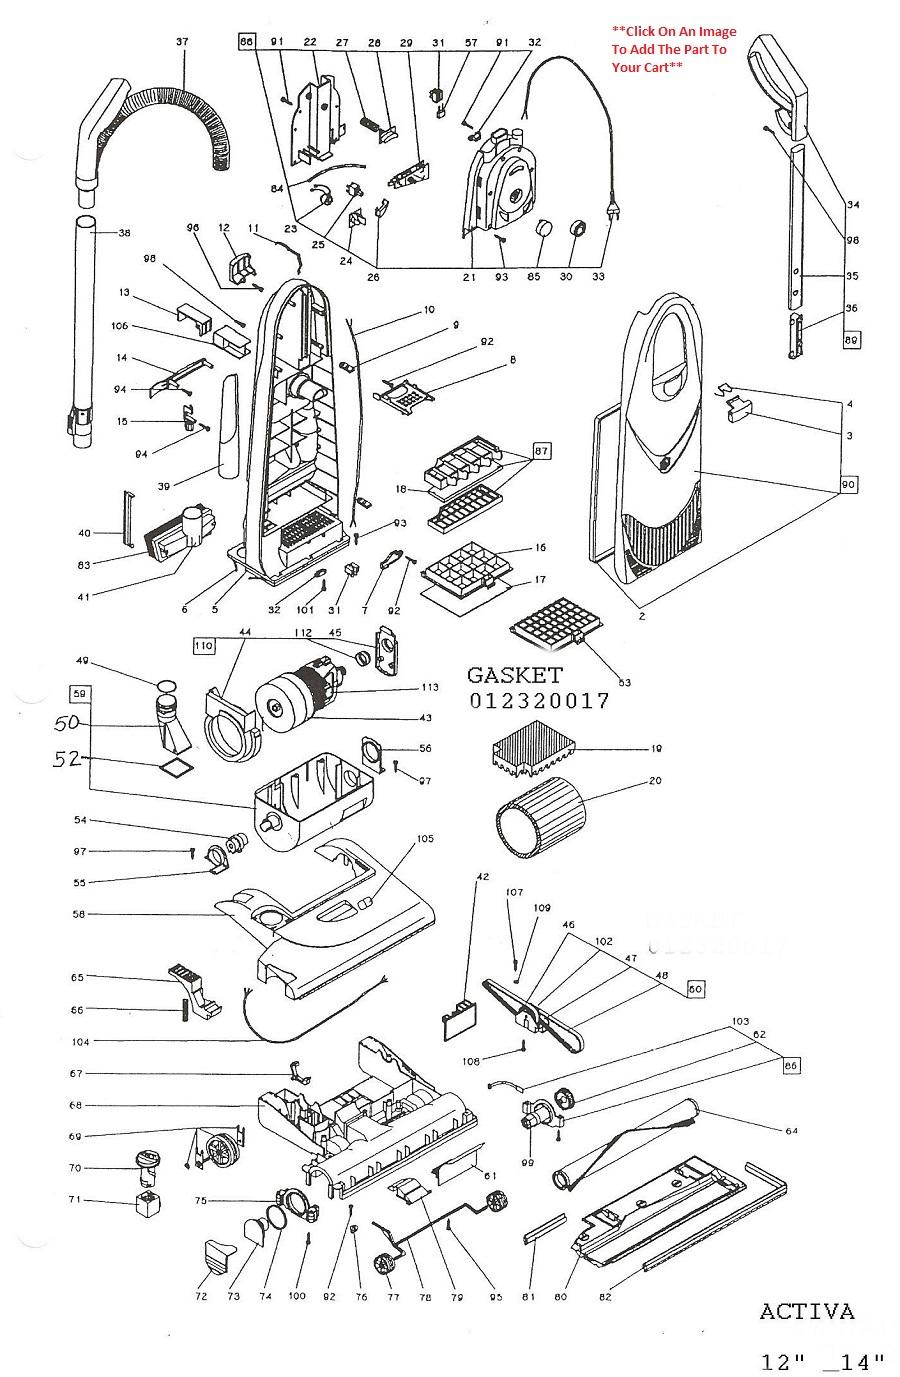 Dish Receiver 722k Dvr Wiring Diagram Dish 722 Receiver